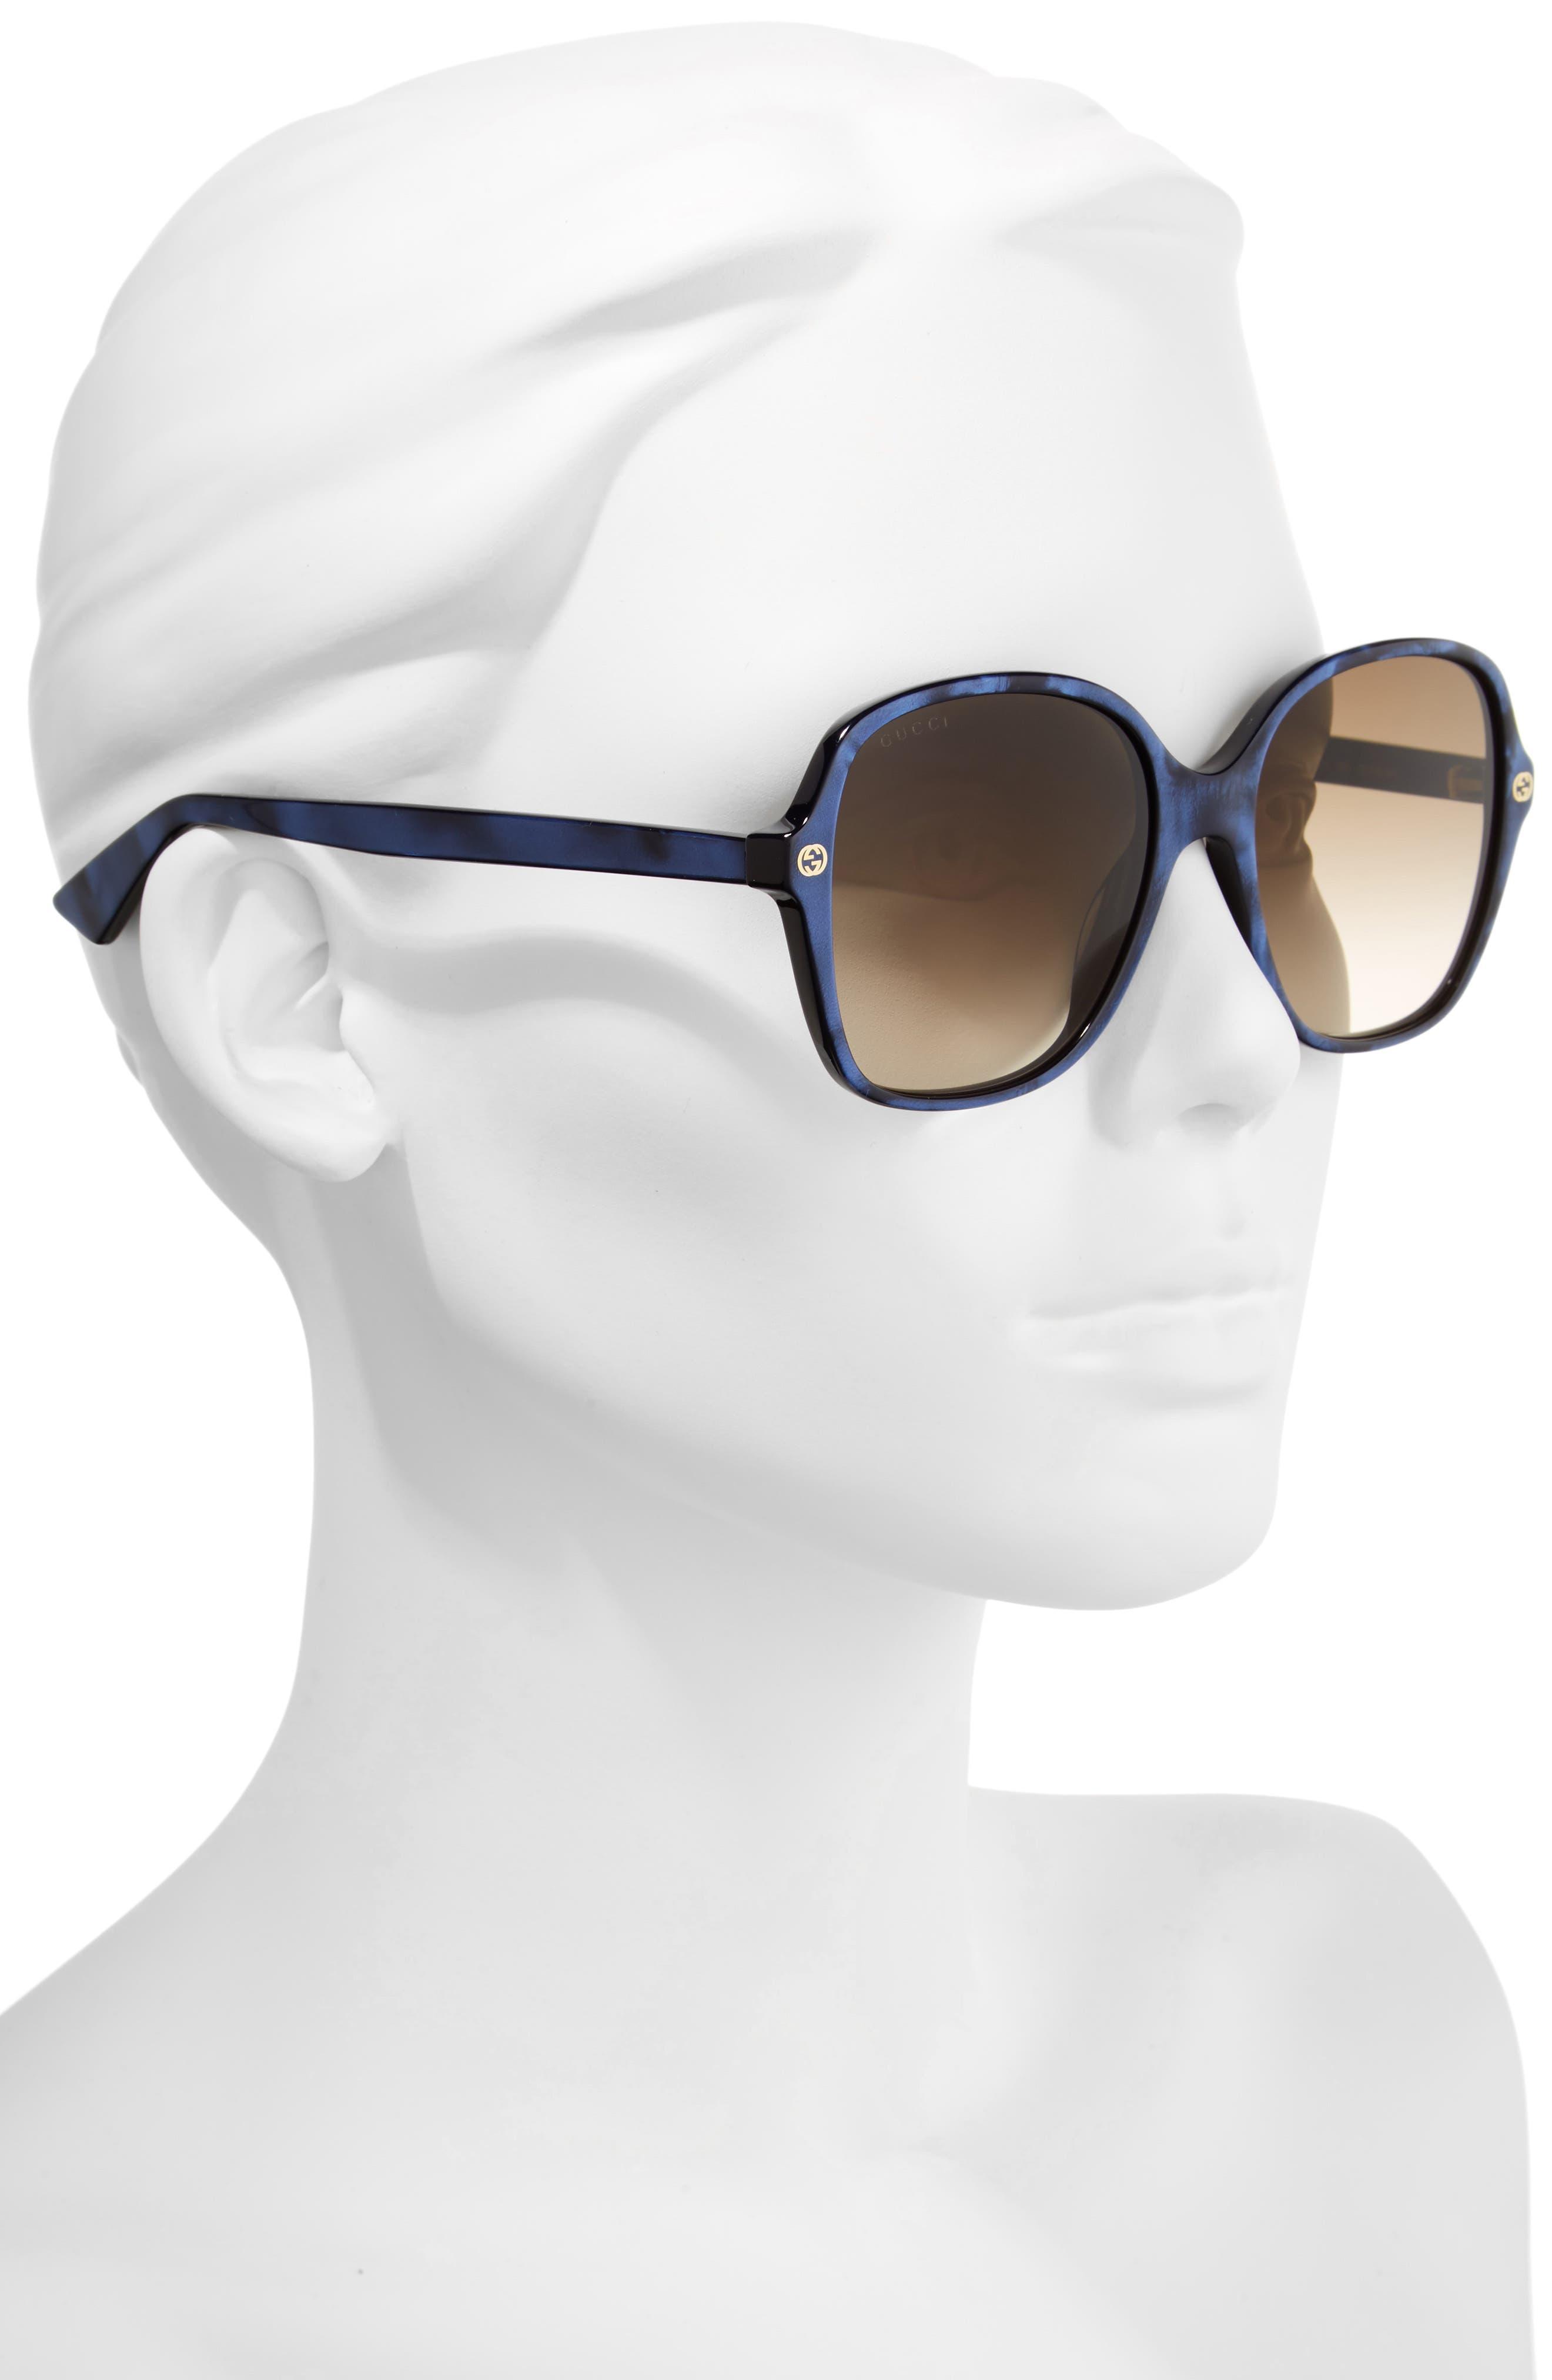 55mm Gradient Sunglasses,                             Alternate thumbnail 2, color,                             Blue/ Brown